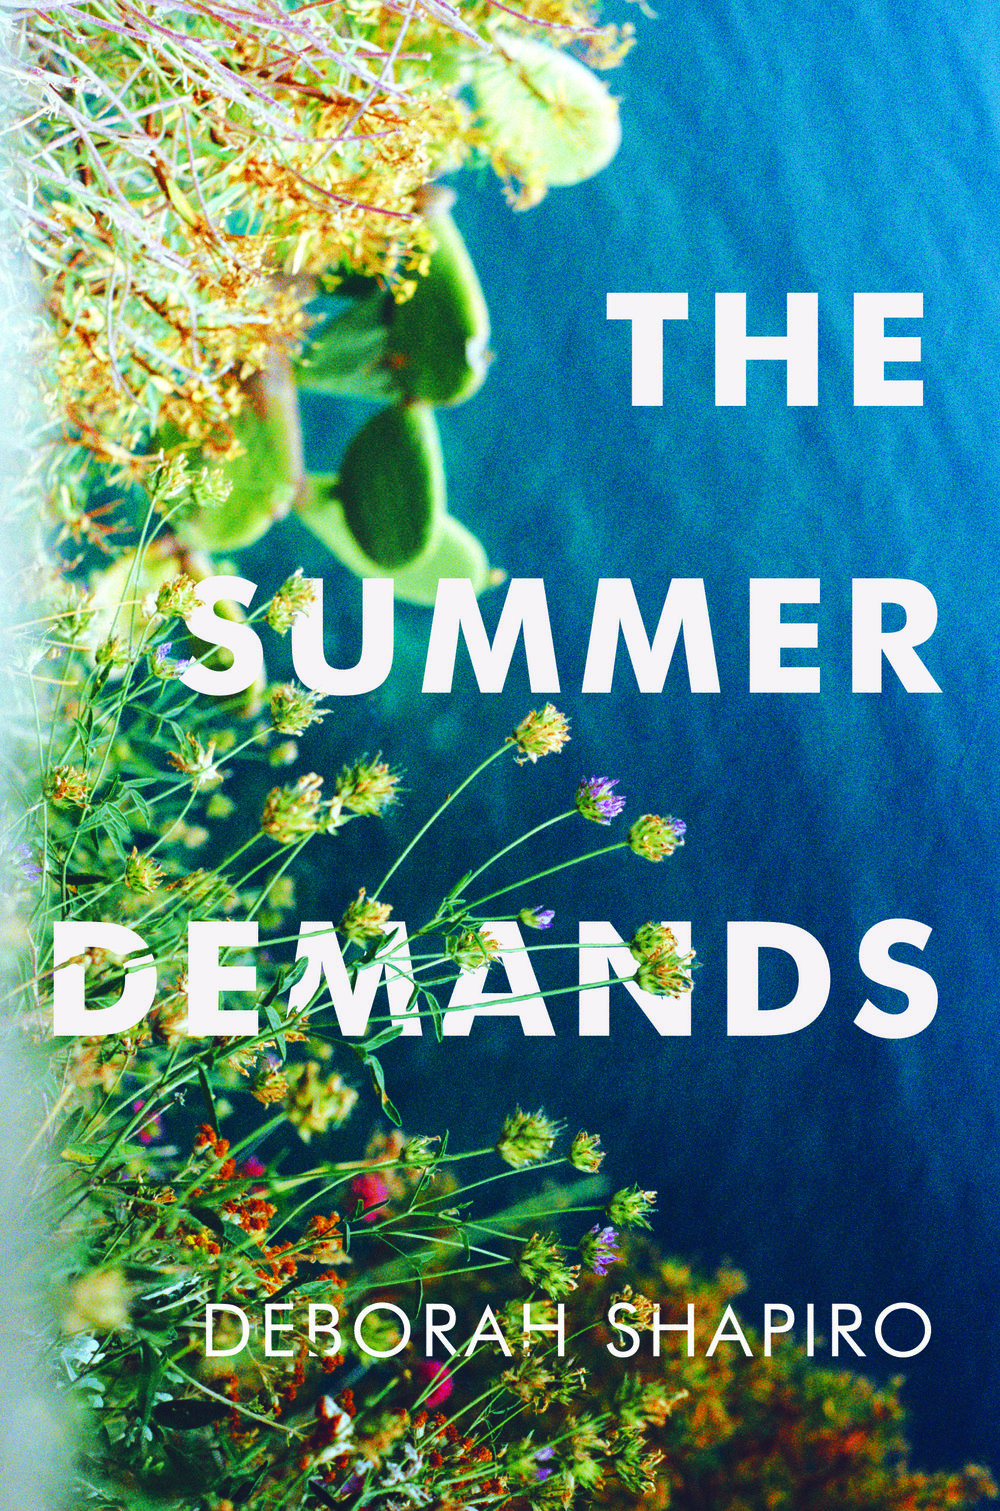 The Summer Demands_cvr_300dpi print res.jpg